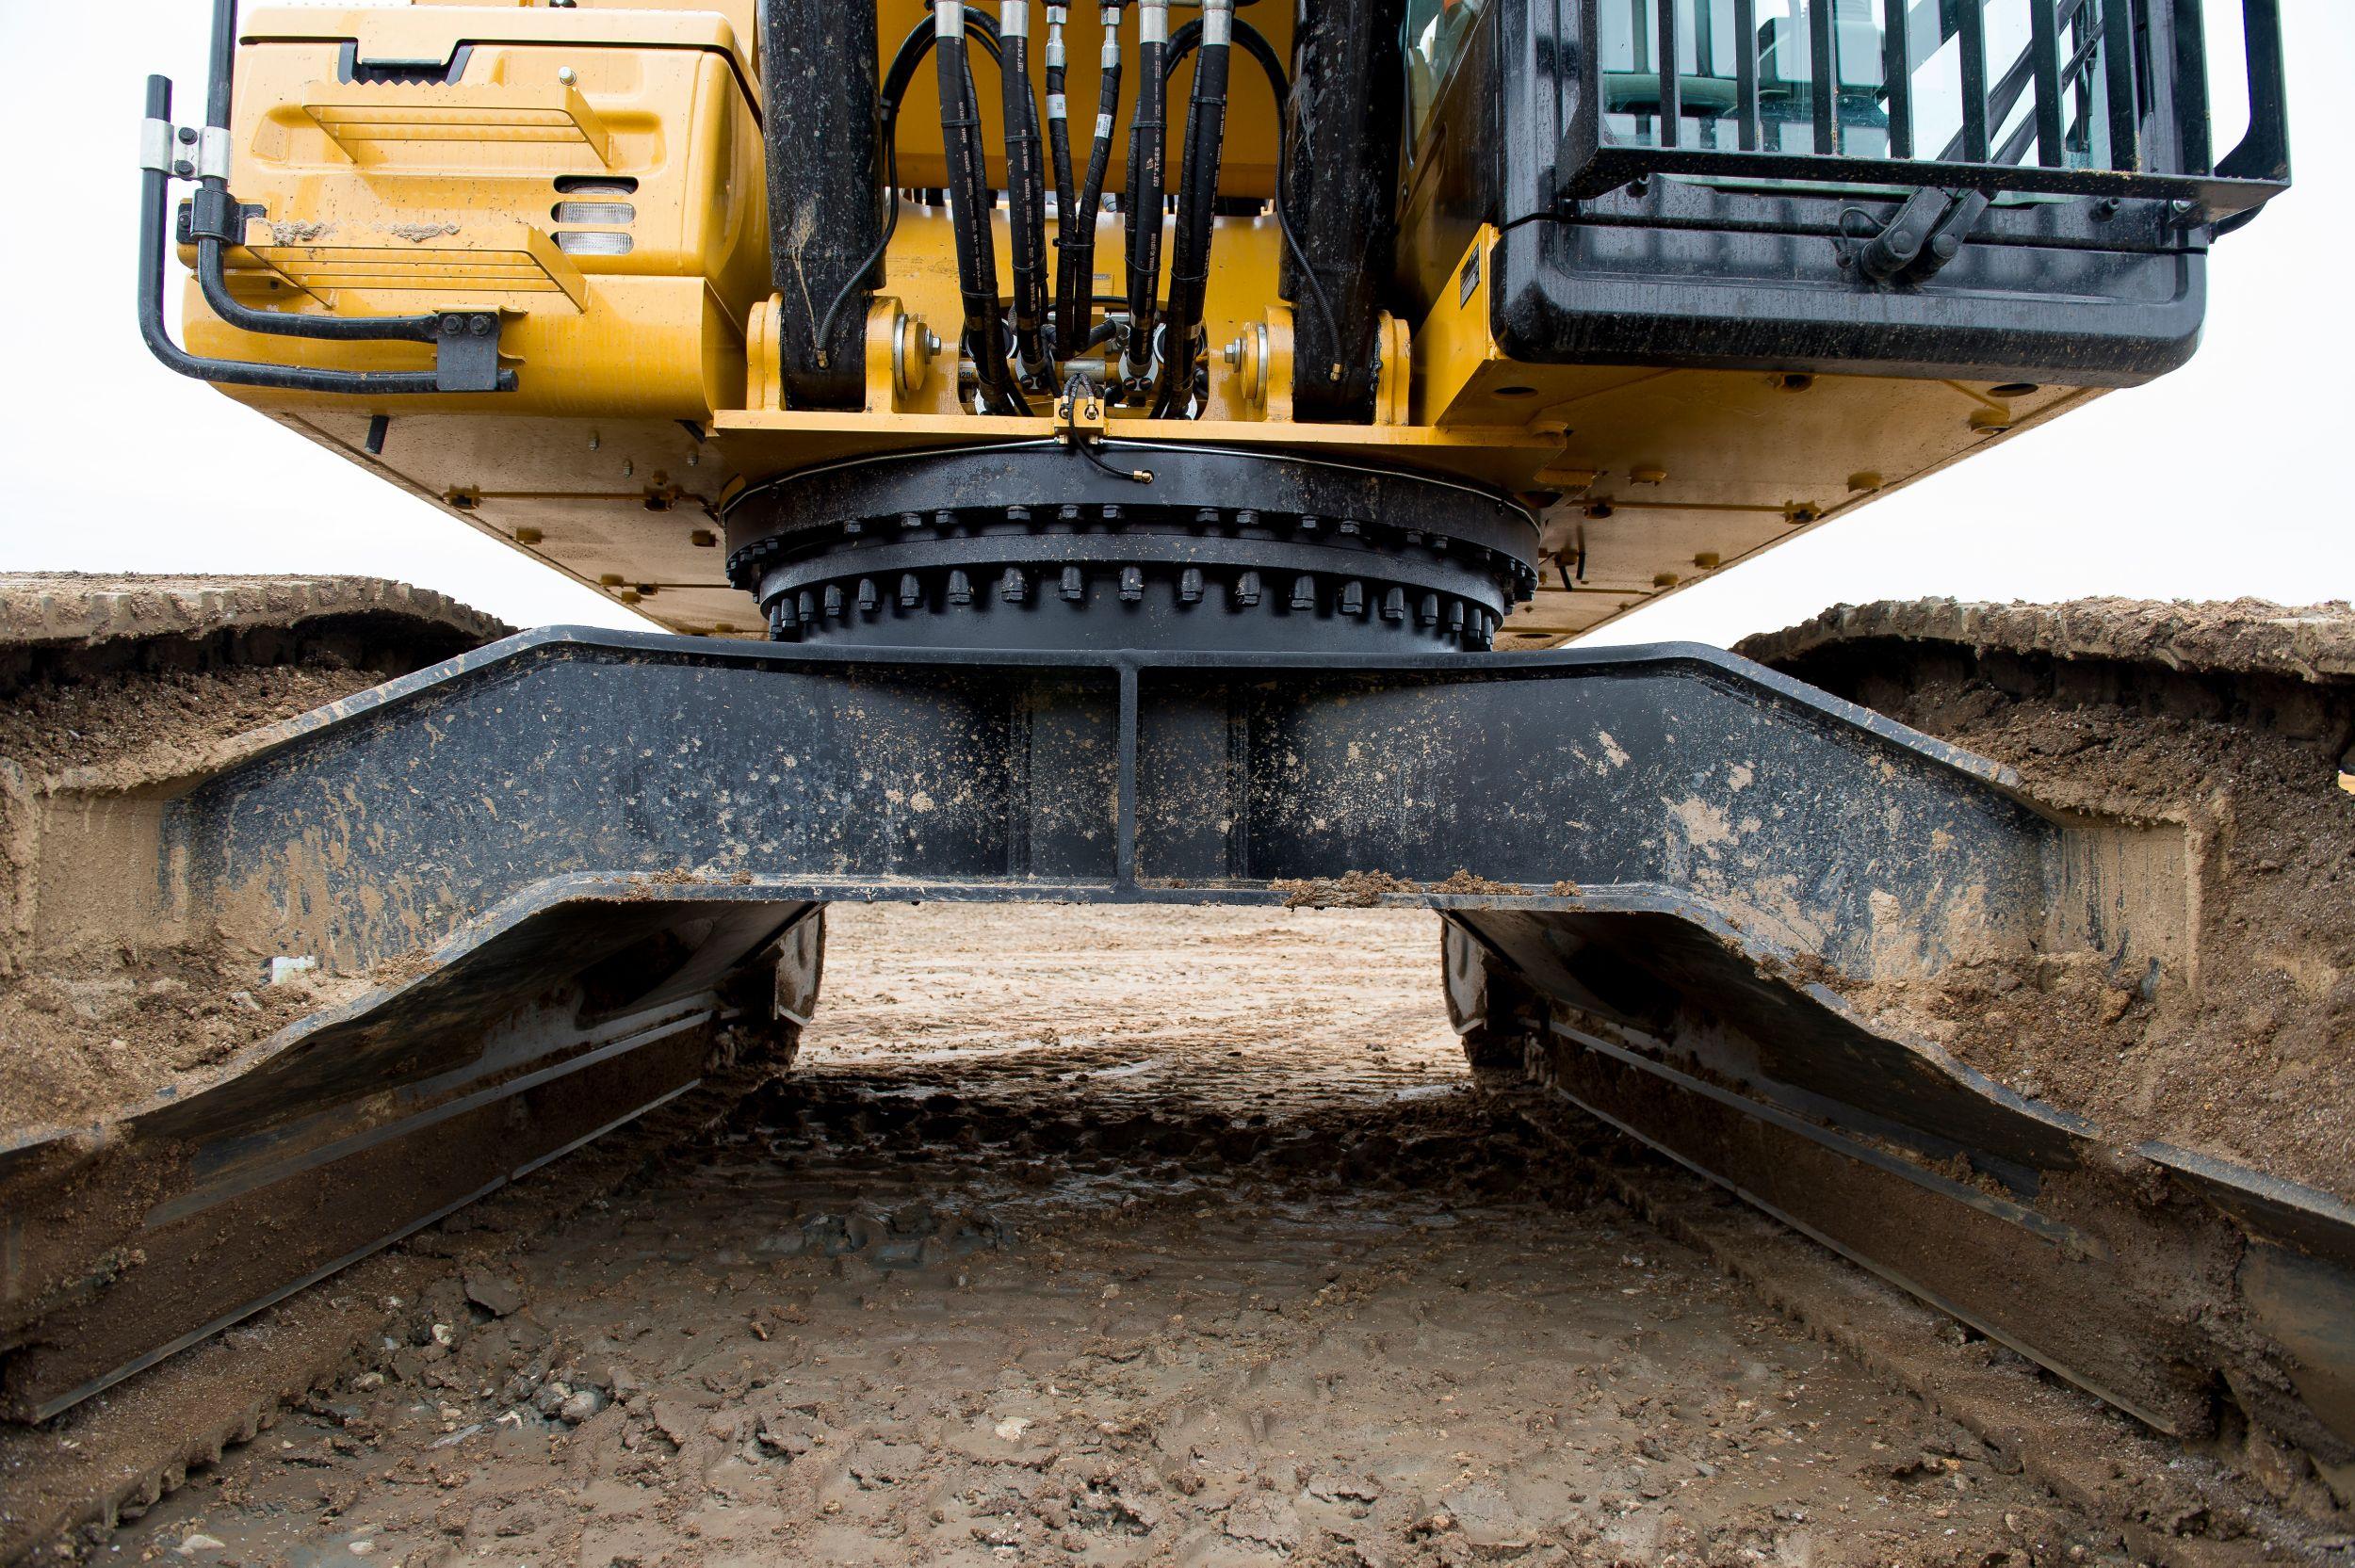 340F Hydraulic Excavator | Finning CAT Ireland